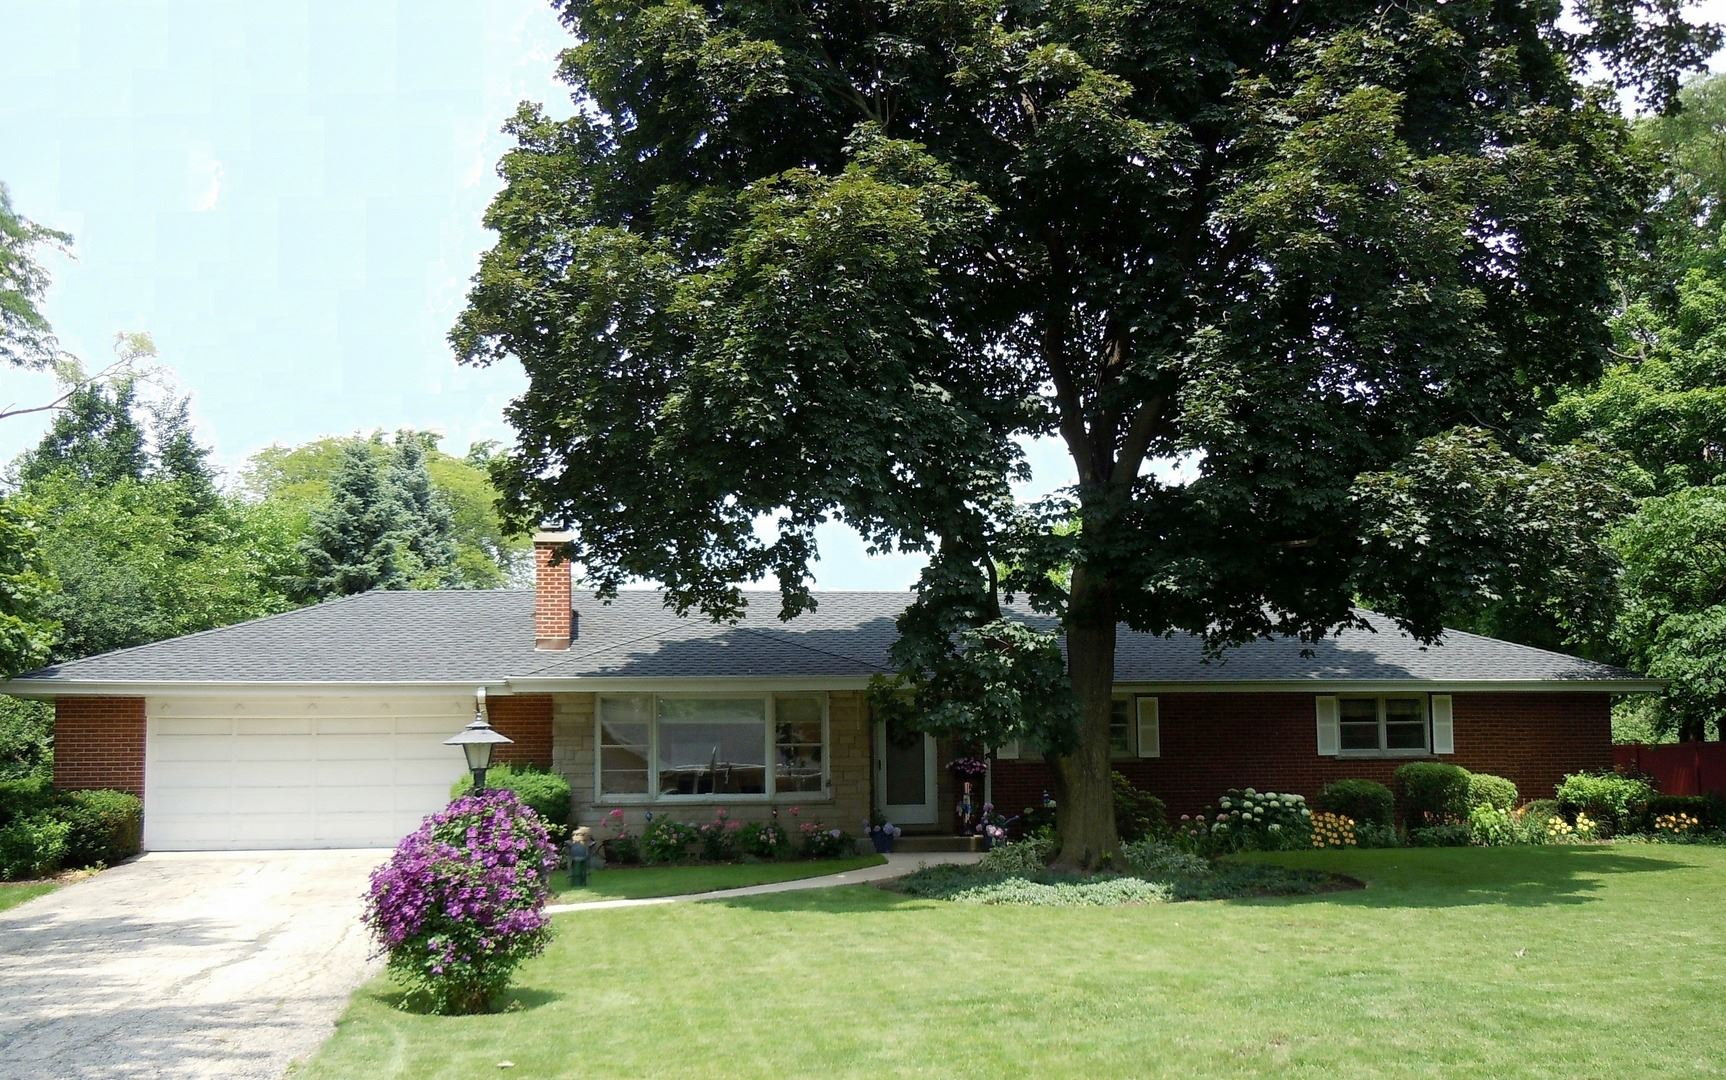 204 Lanford Lane, Prospect Heights, IL 60070 - #: 10651098